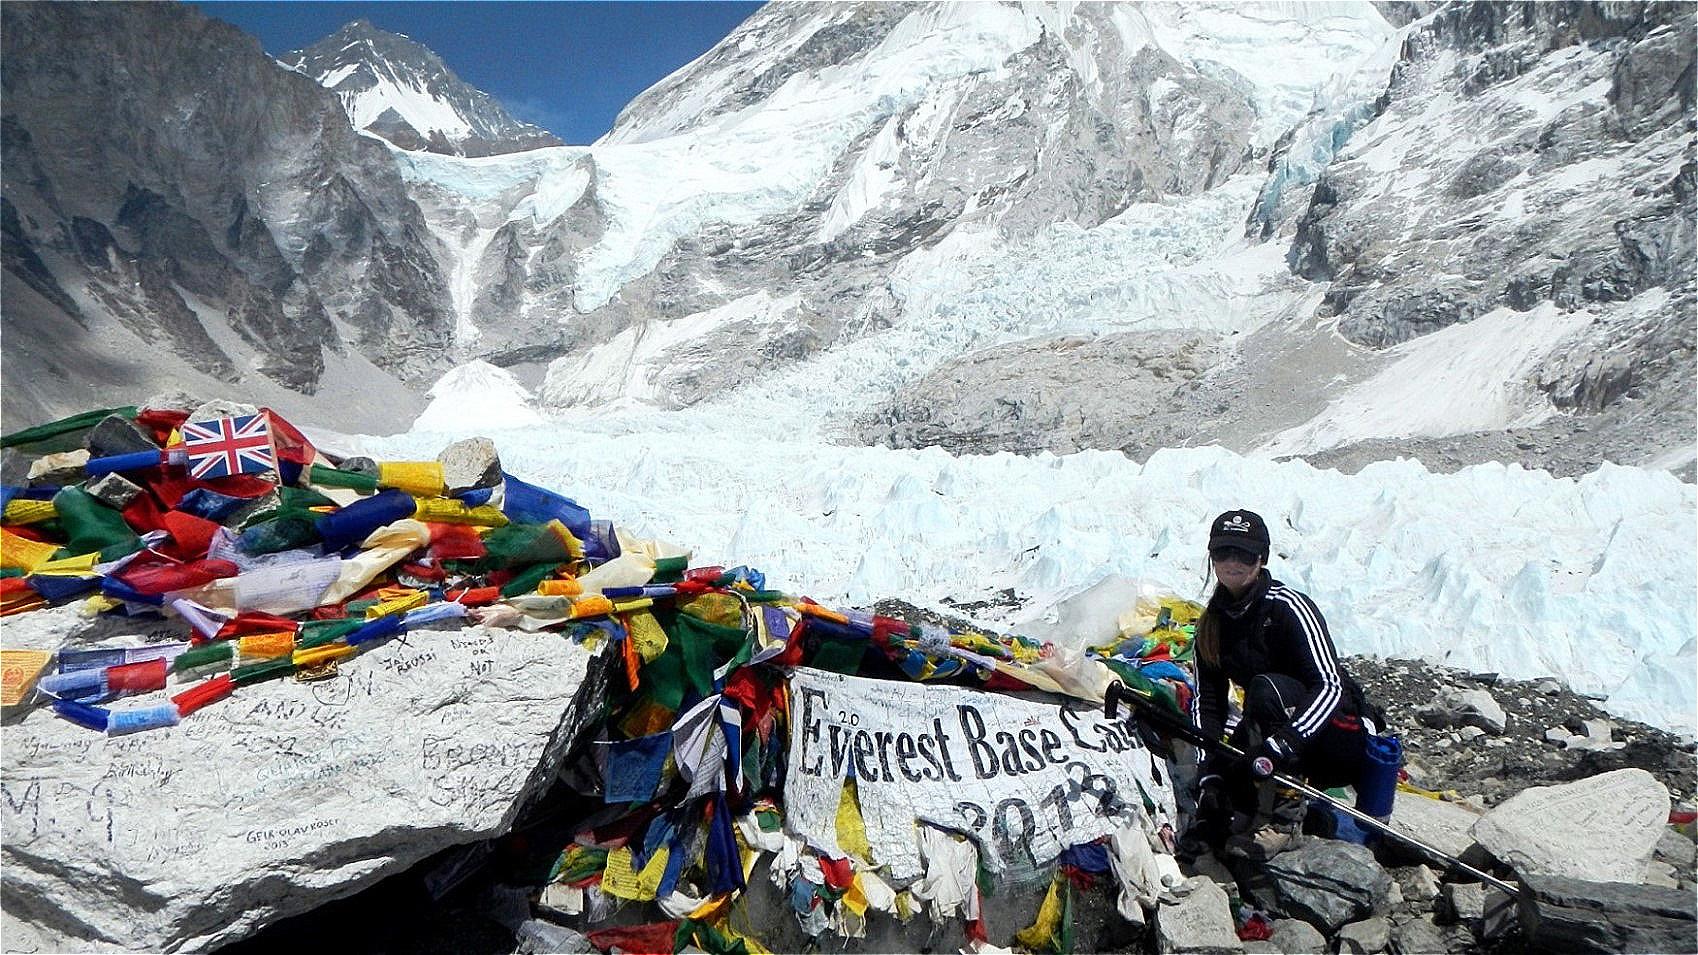 Everest South Base Camp -  5.364 m Nepal - April 2013